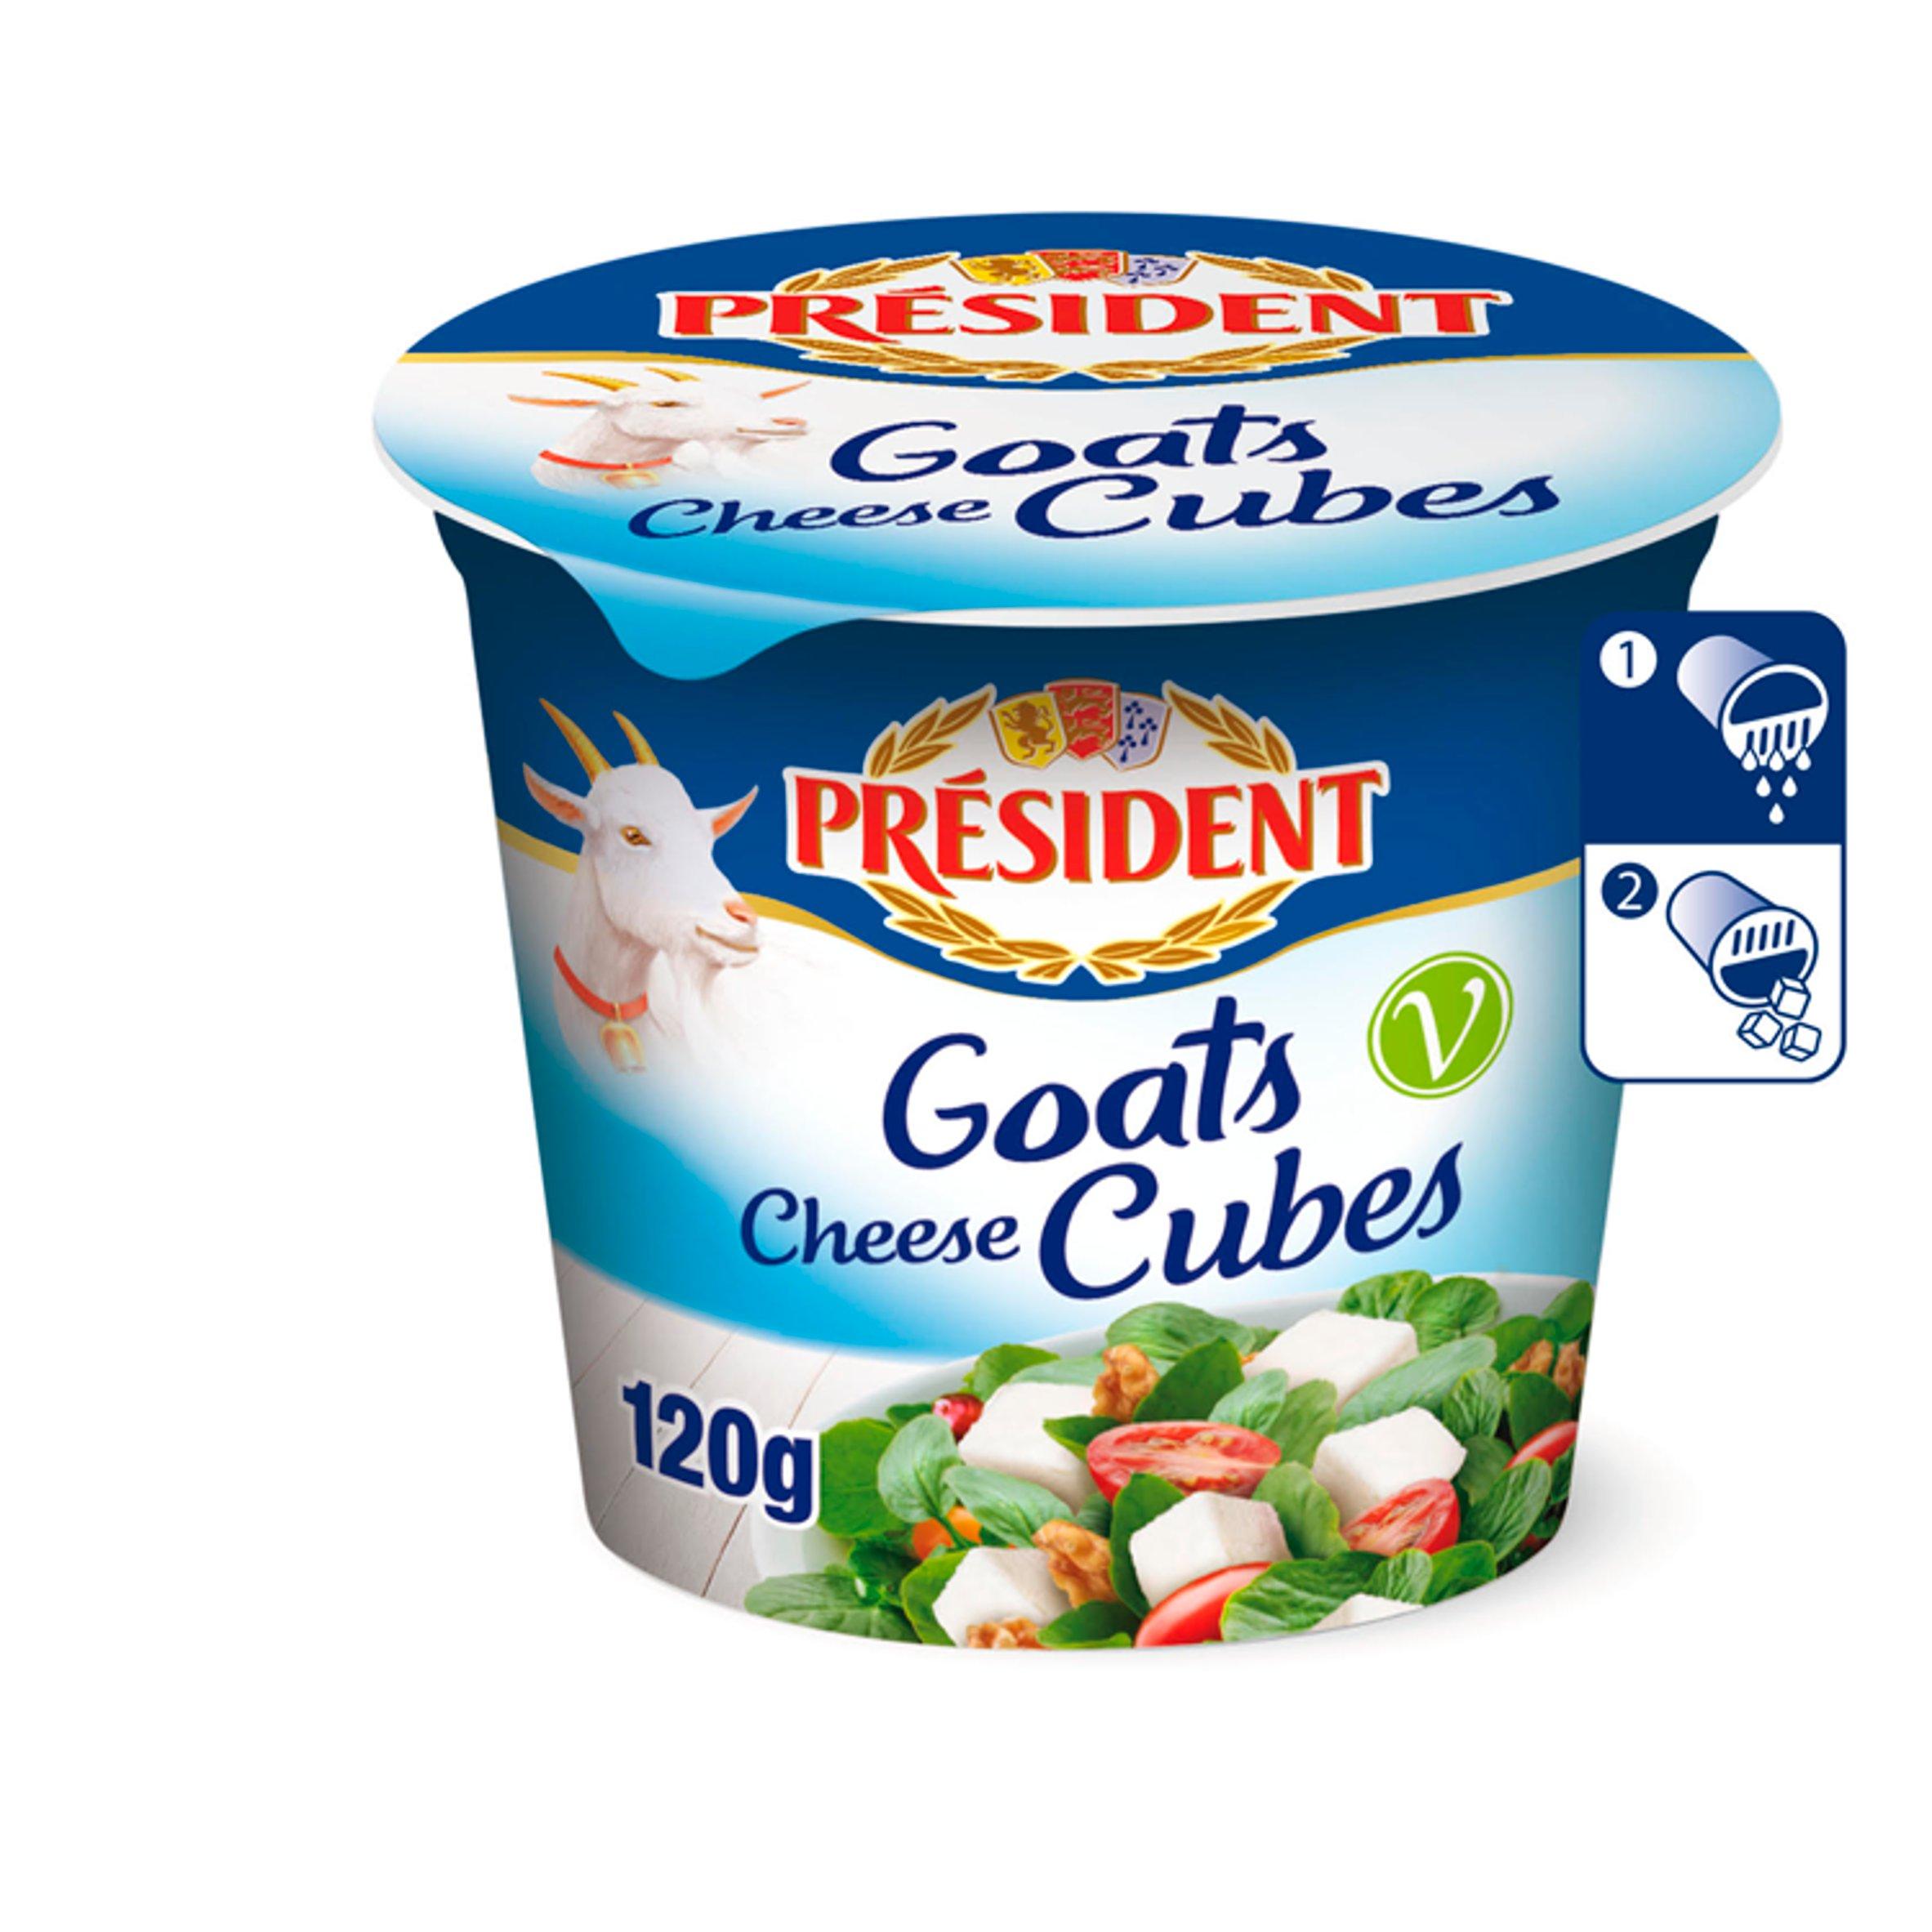 President Goats Cheese Cubes 300G